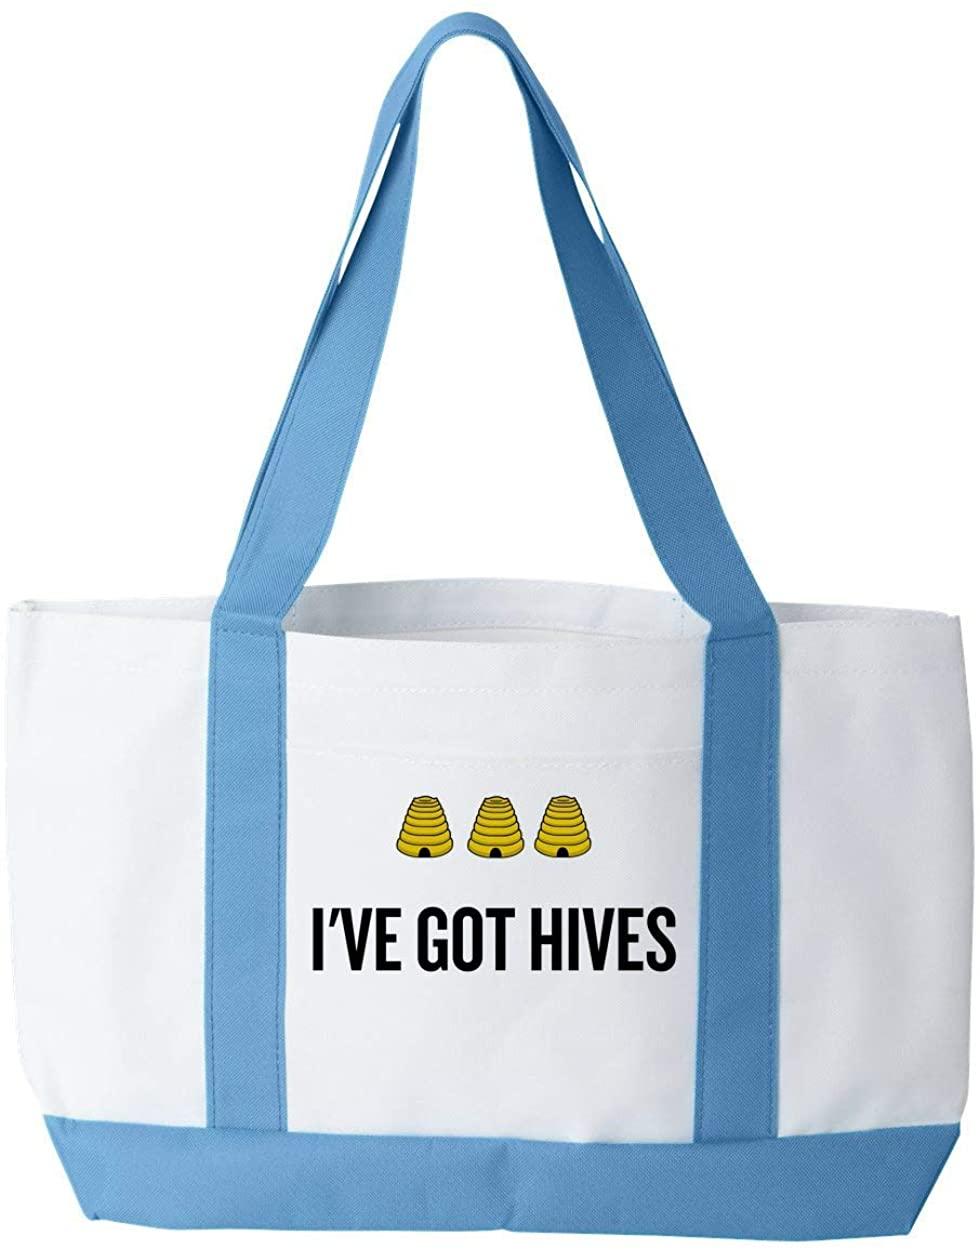 Beekeeping Tote Bag Gift - Beekeeper, Apiarist Present Idea - I've Got Hives